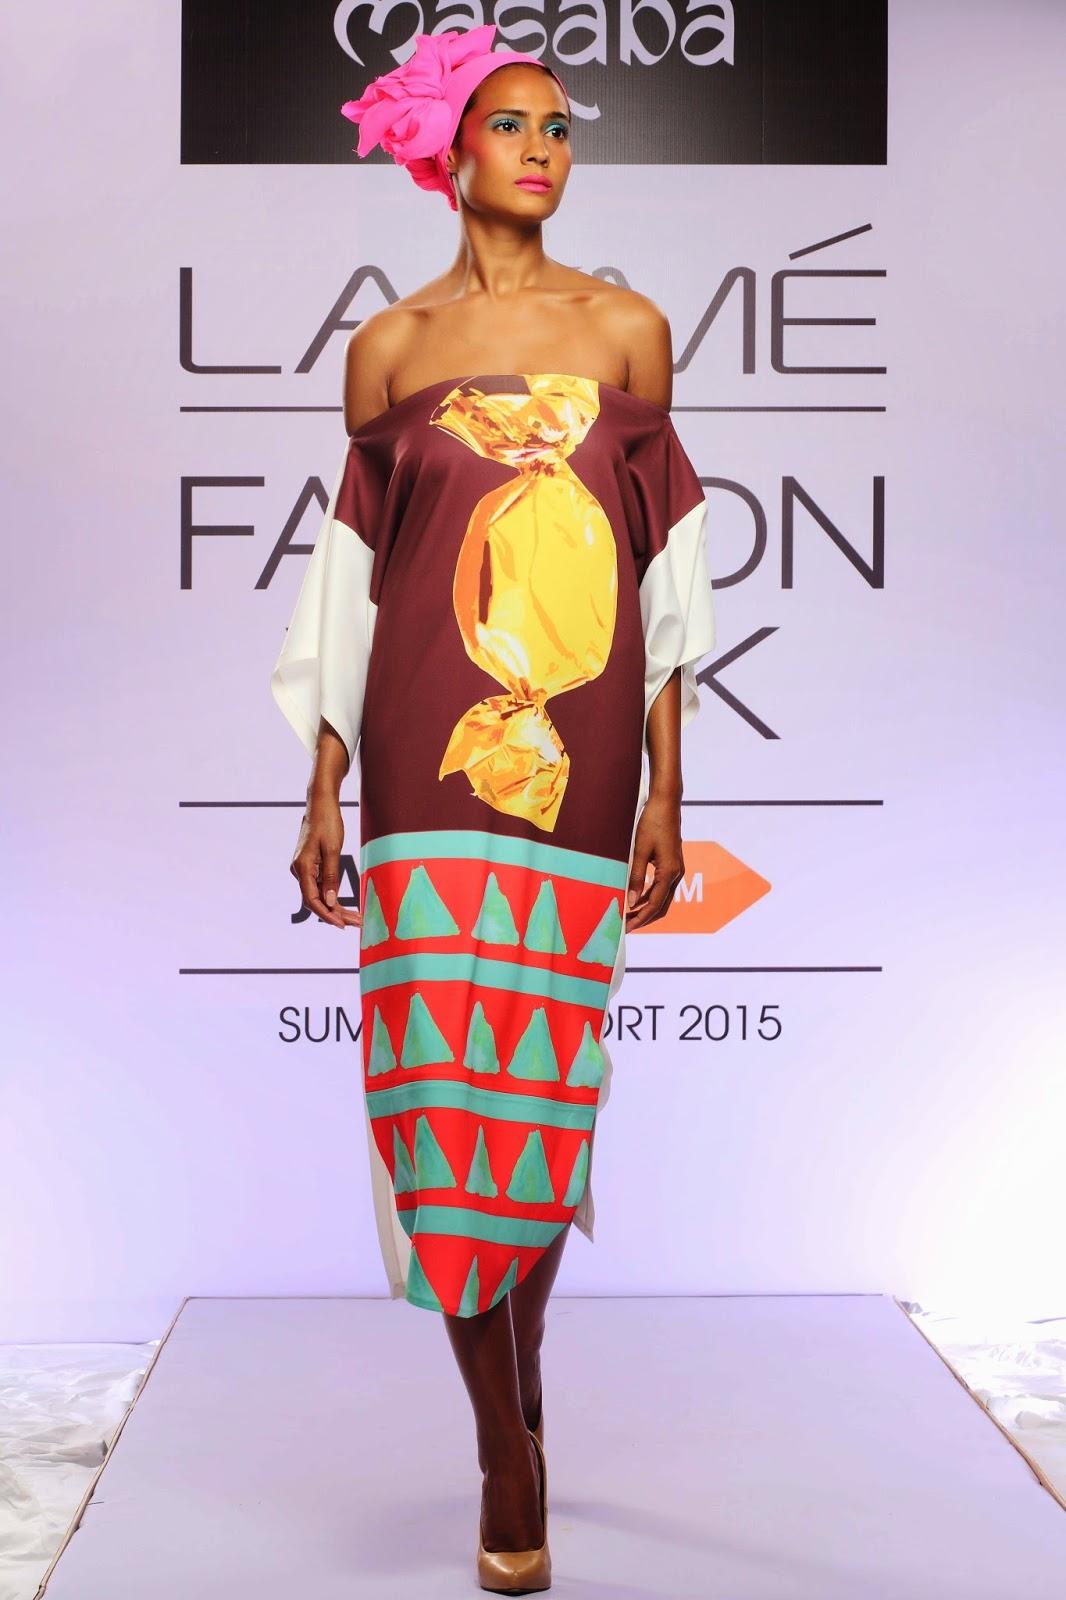 http://aquaintperspective.blogspot.in/, LIFW Day 1, Masaba Gupta